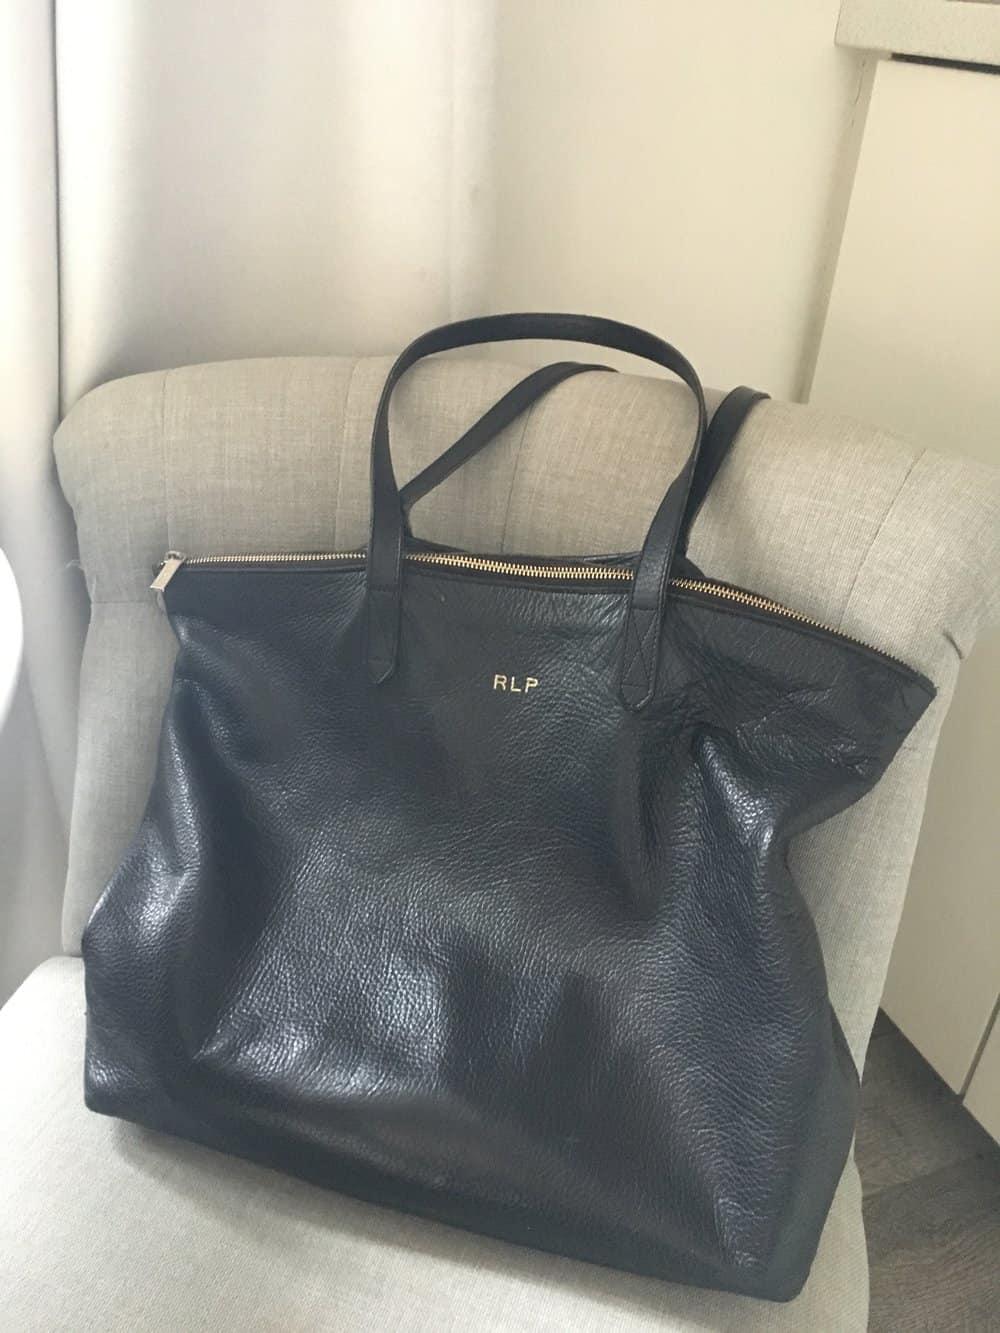 cuyana travel bag